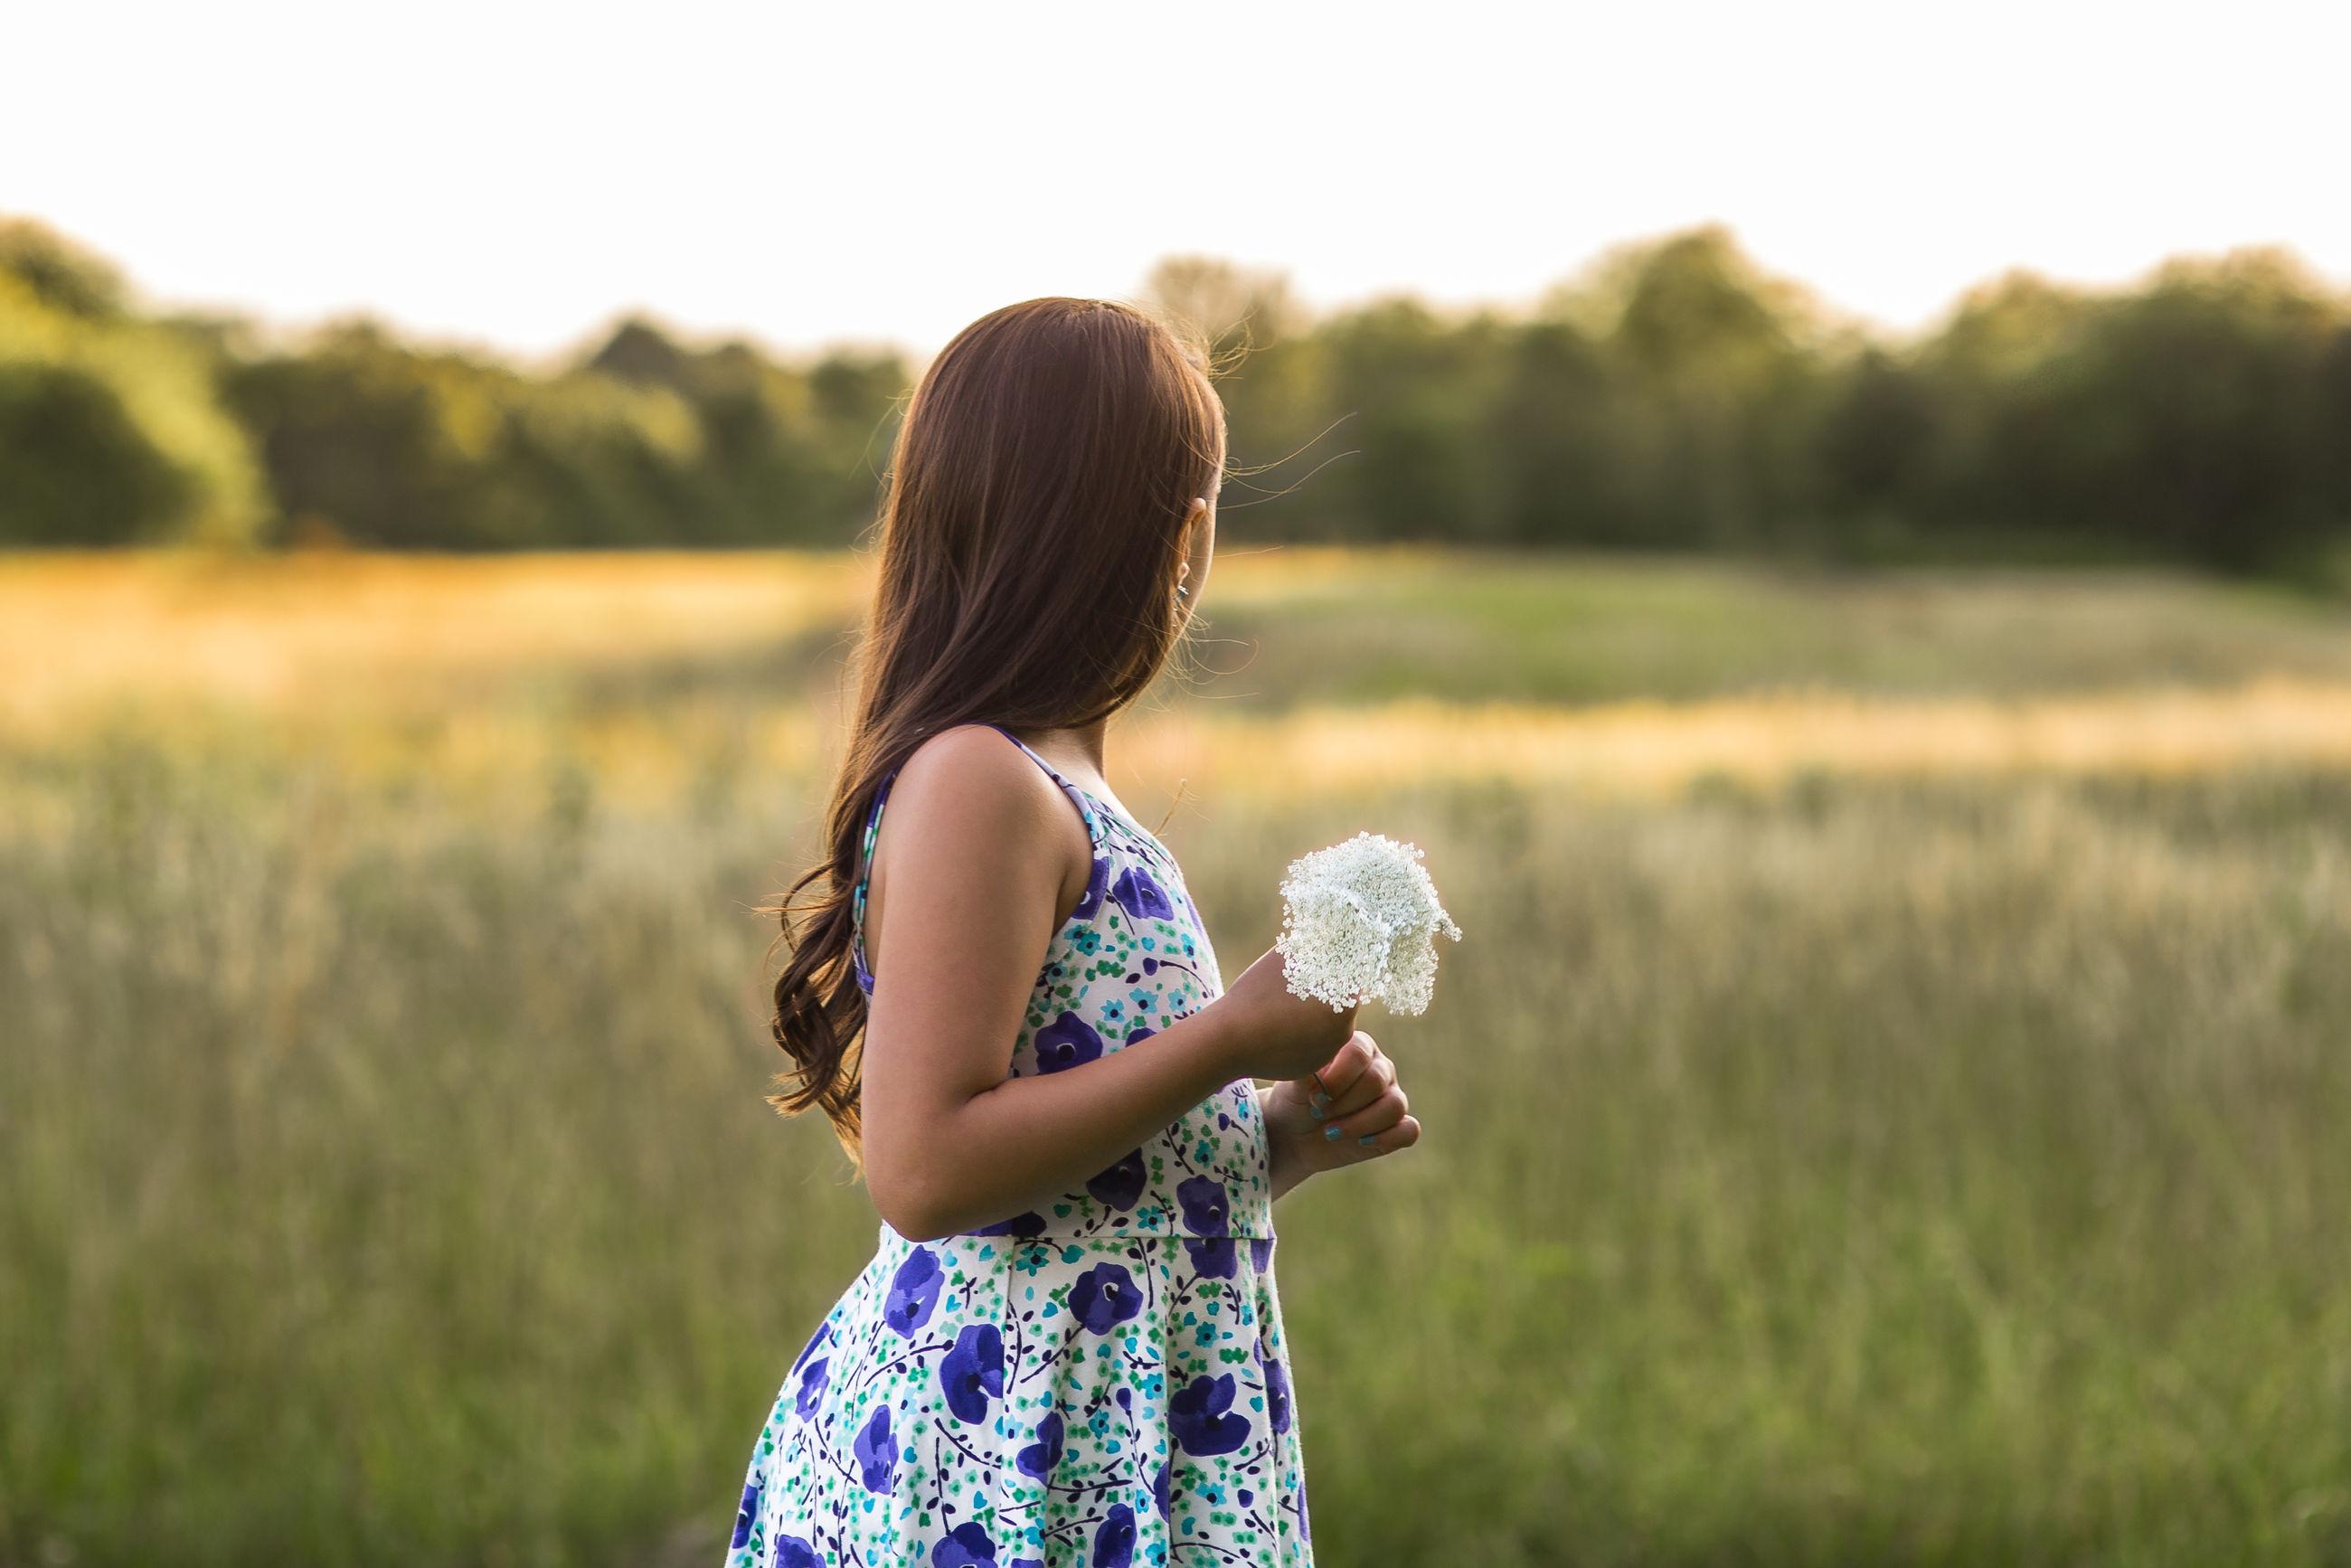 Girl holding flower while standing on field against sky